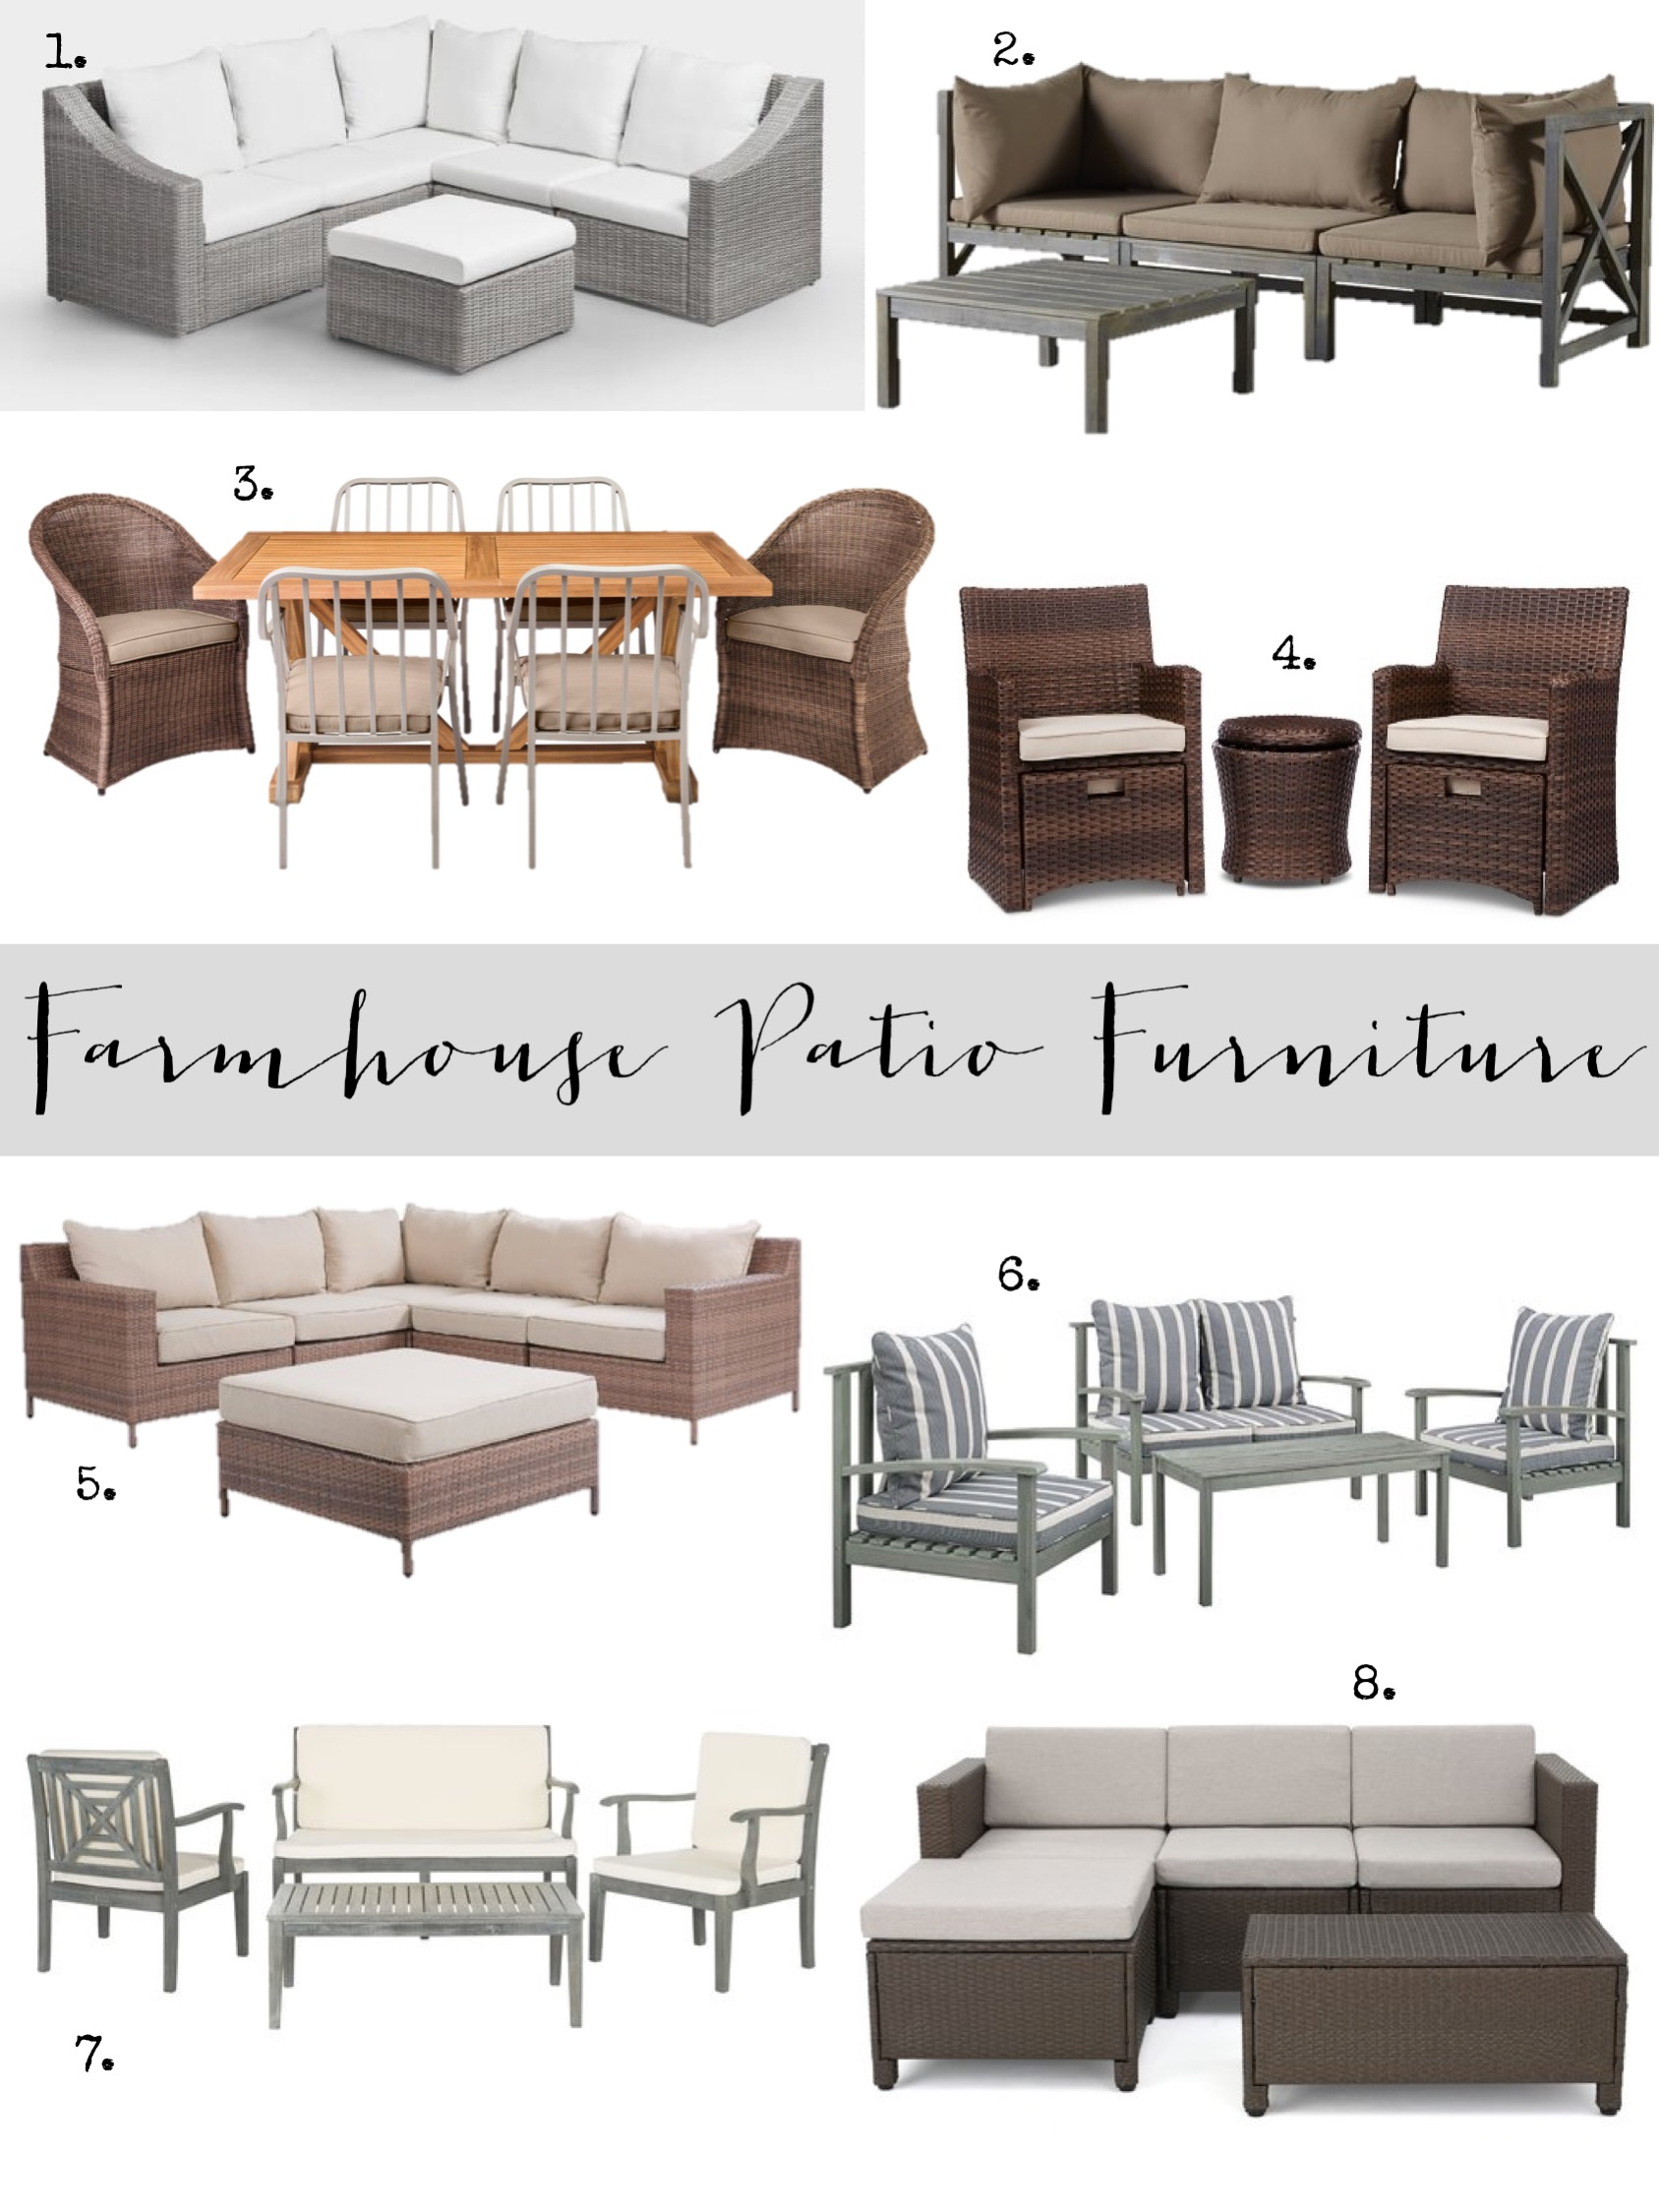 farmhouse patio furniture finds house